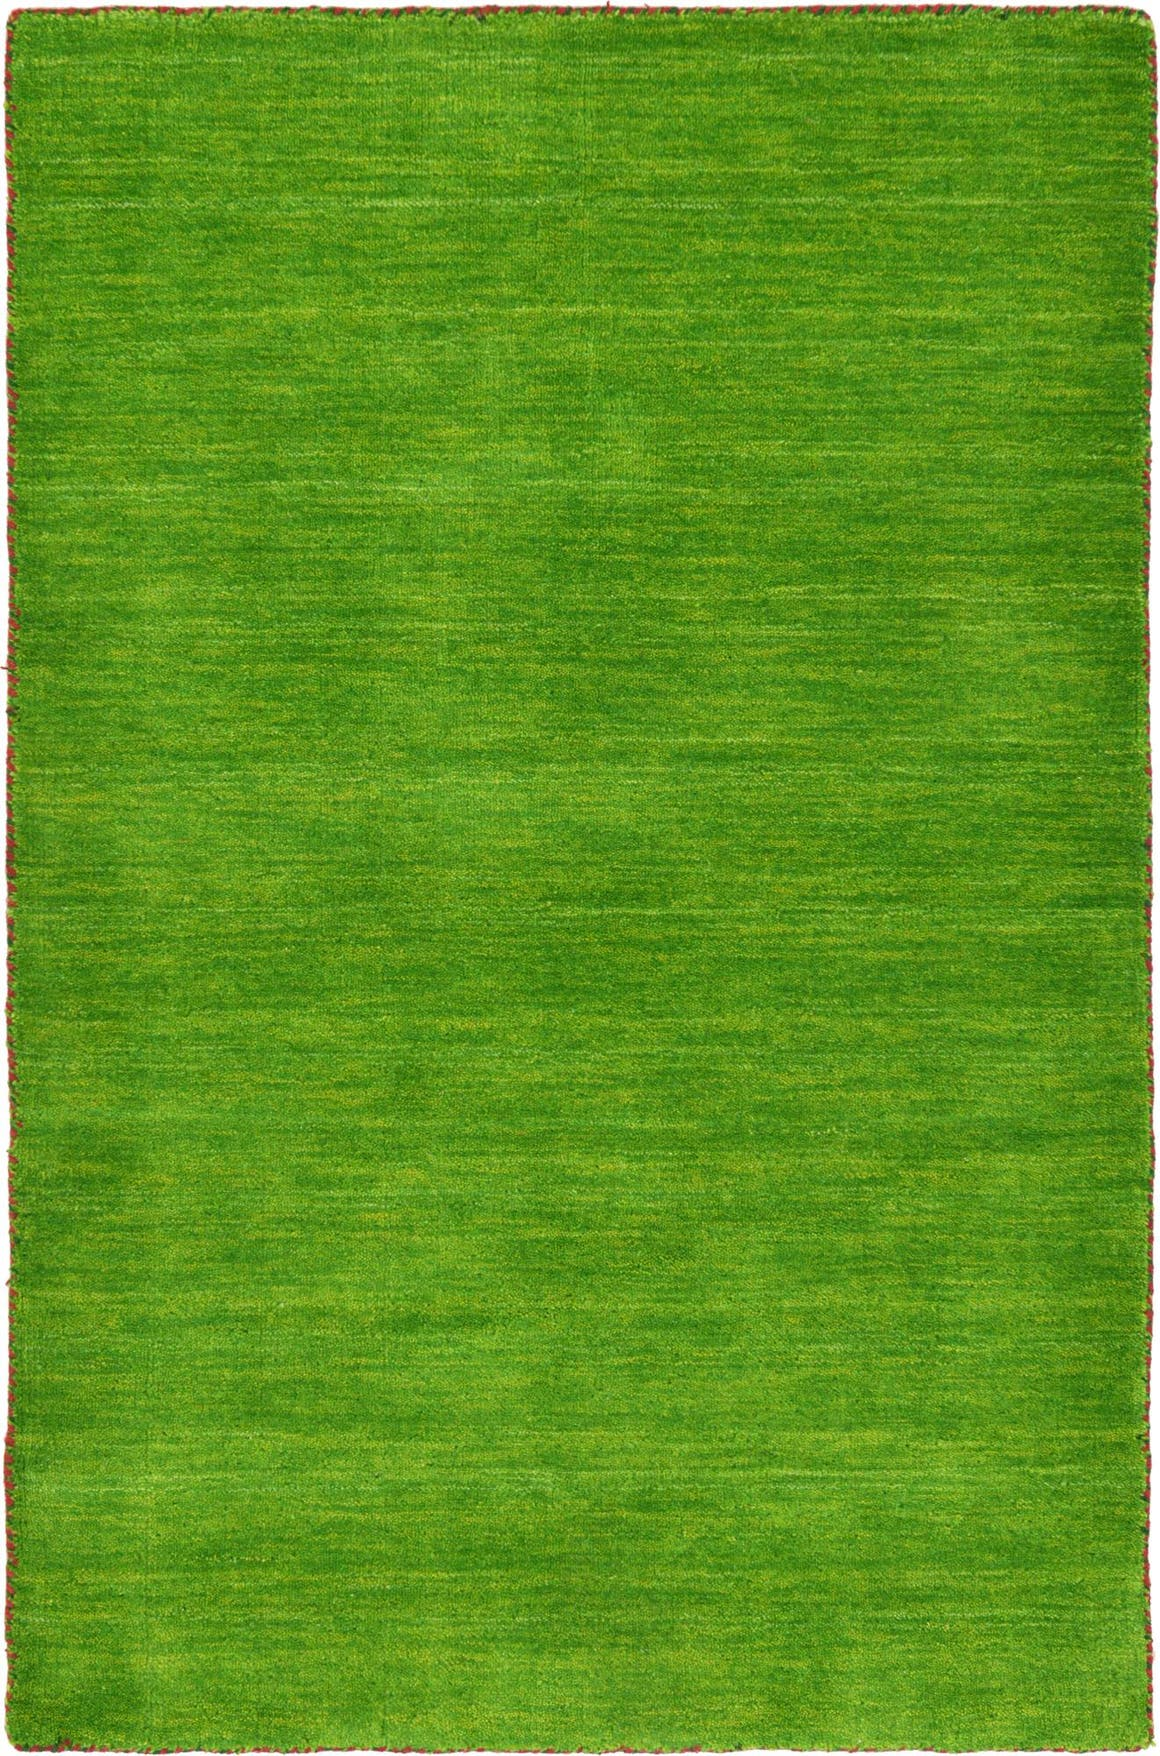 3' 3 x 5' 3 Solid Gabbeh Rug main image